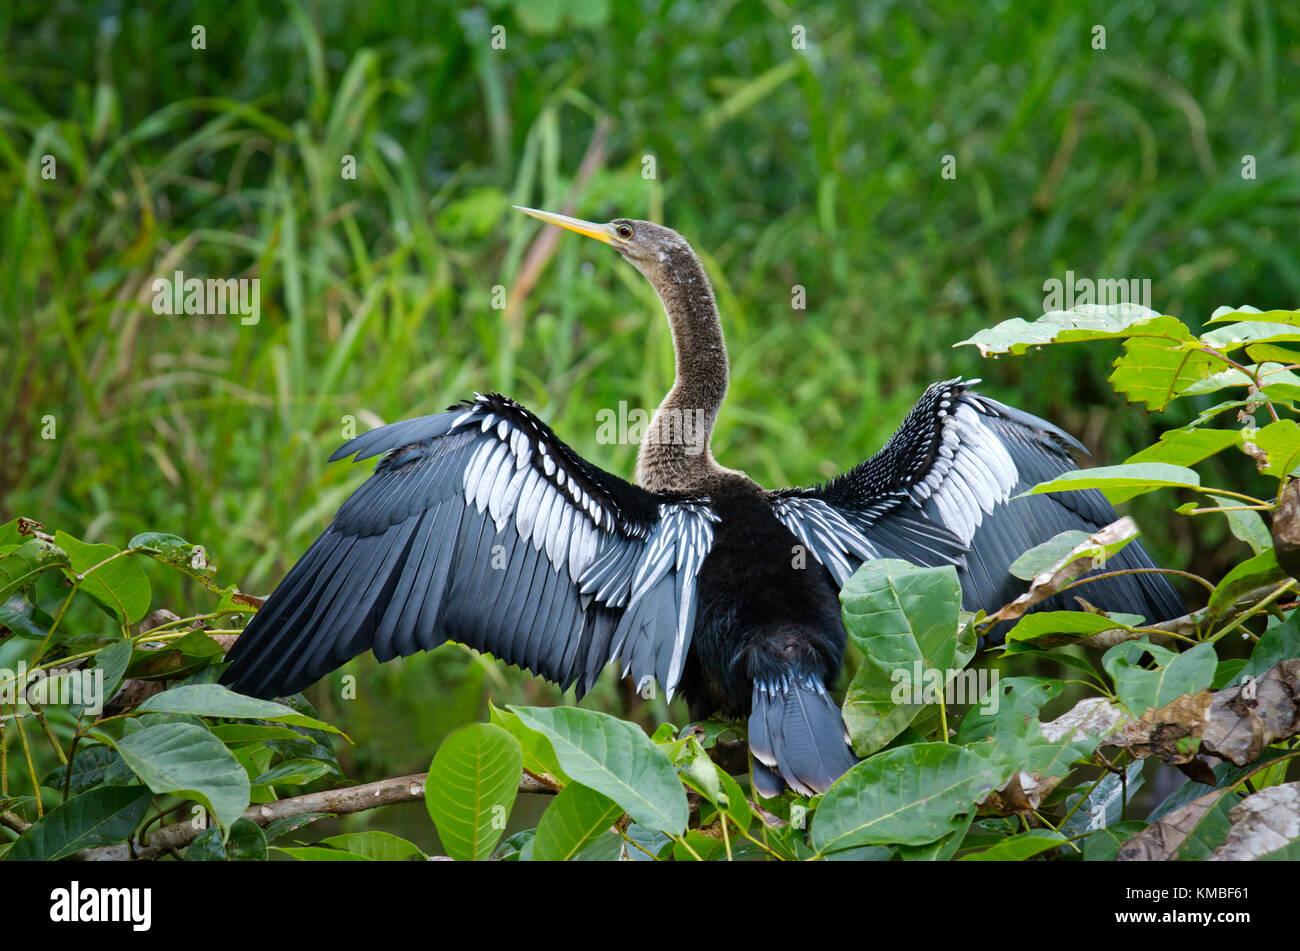 Neotropic cormorant (Phalacrocorax brasilianus) drying its feathers. - Stock Image